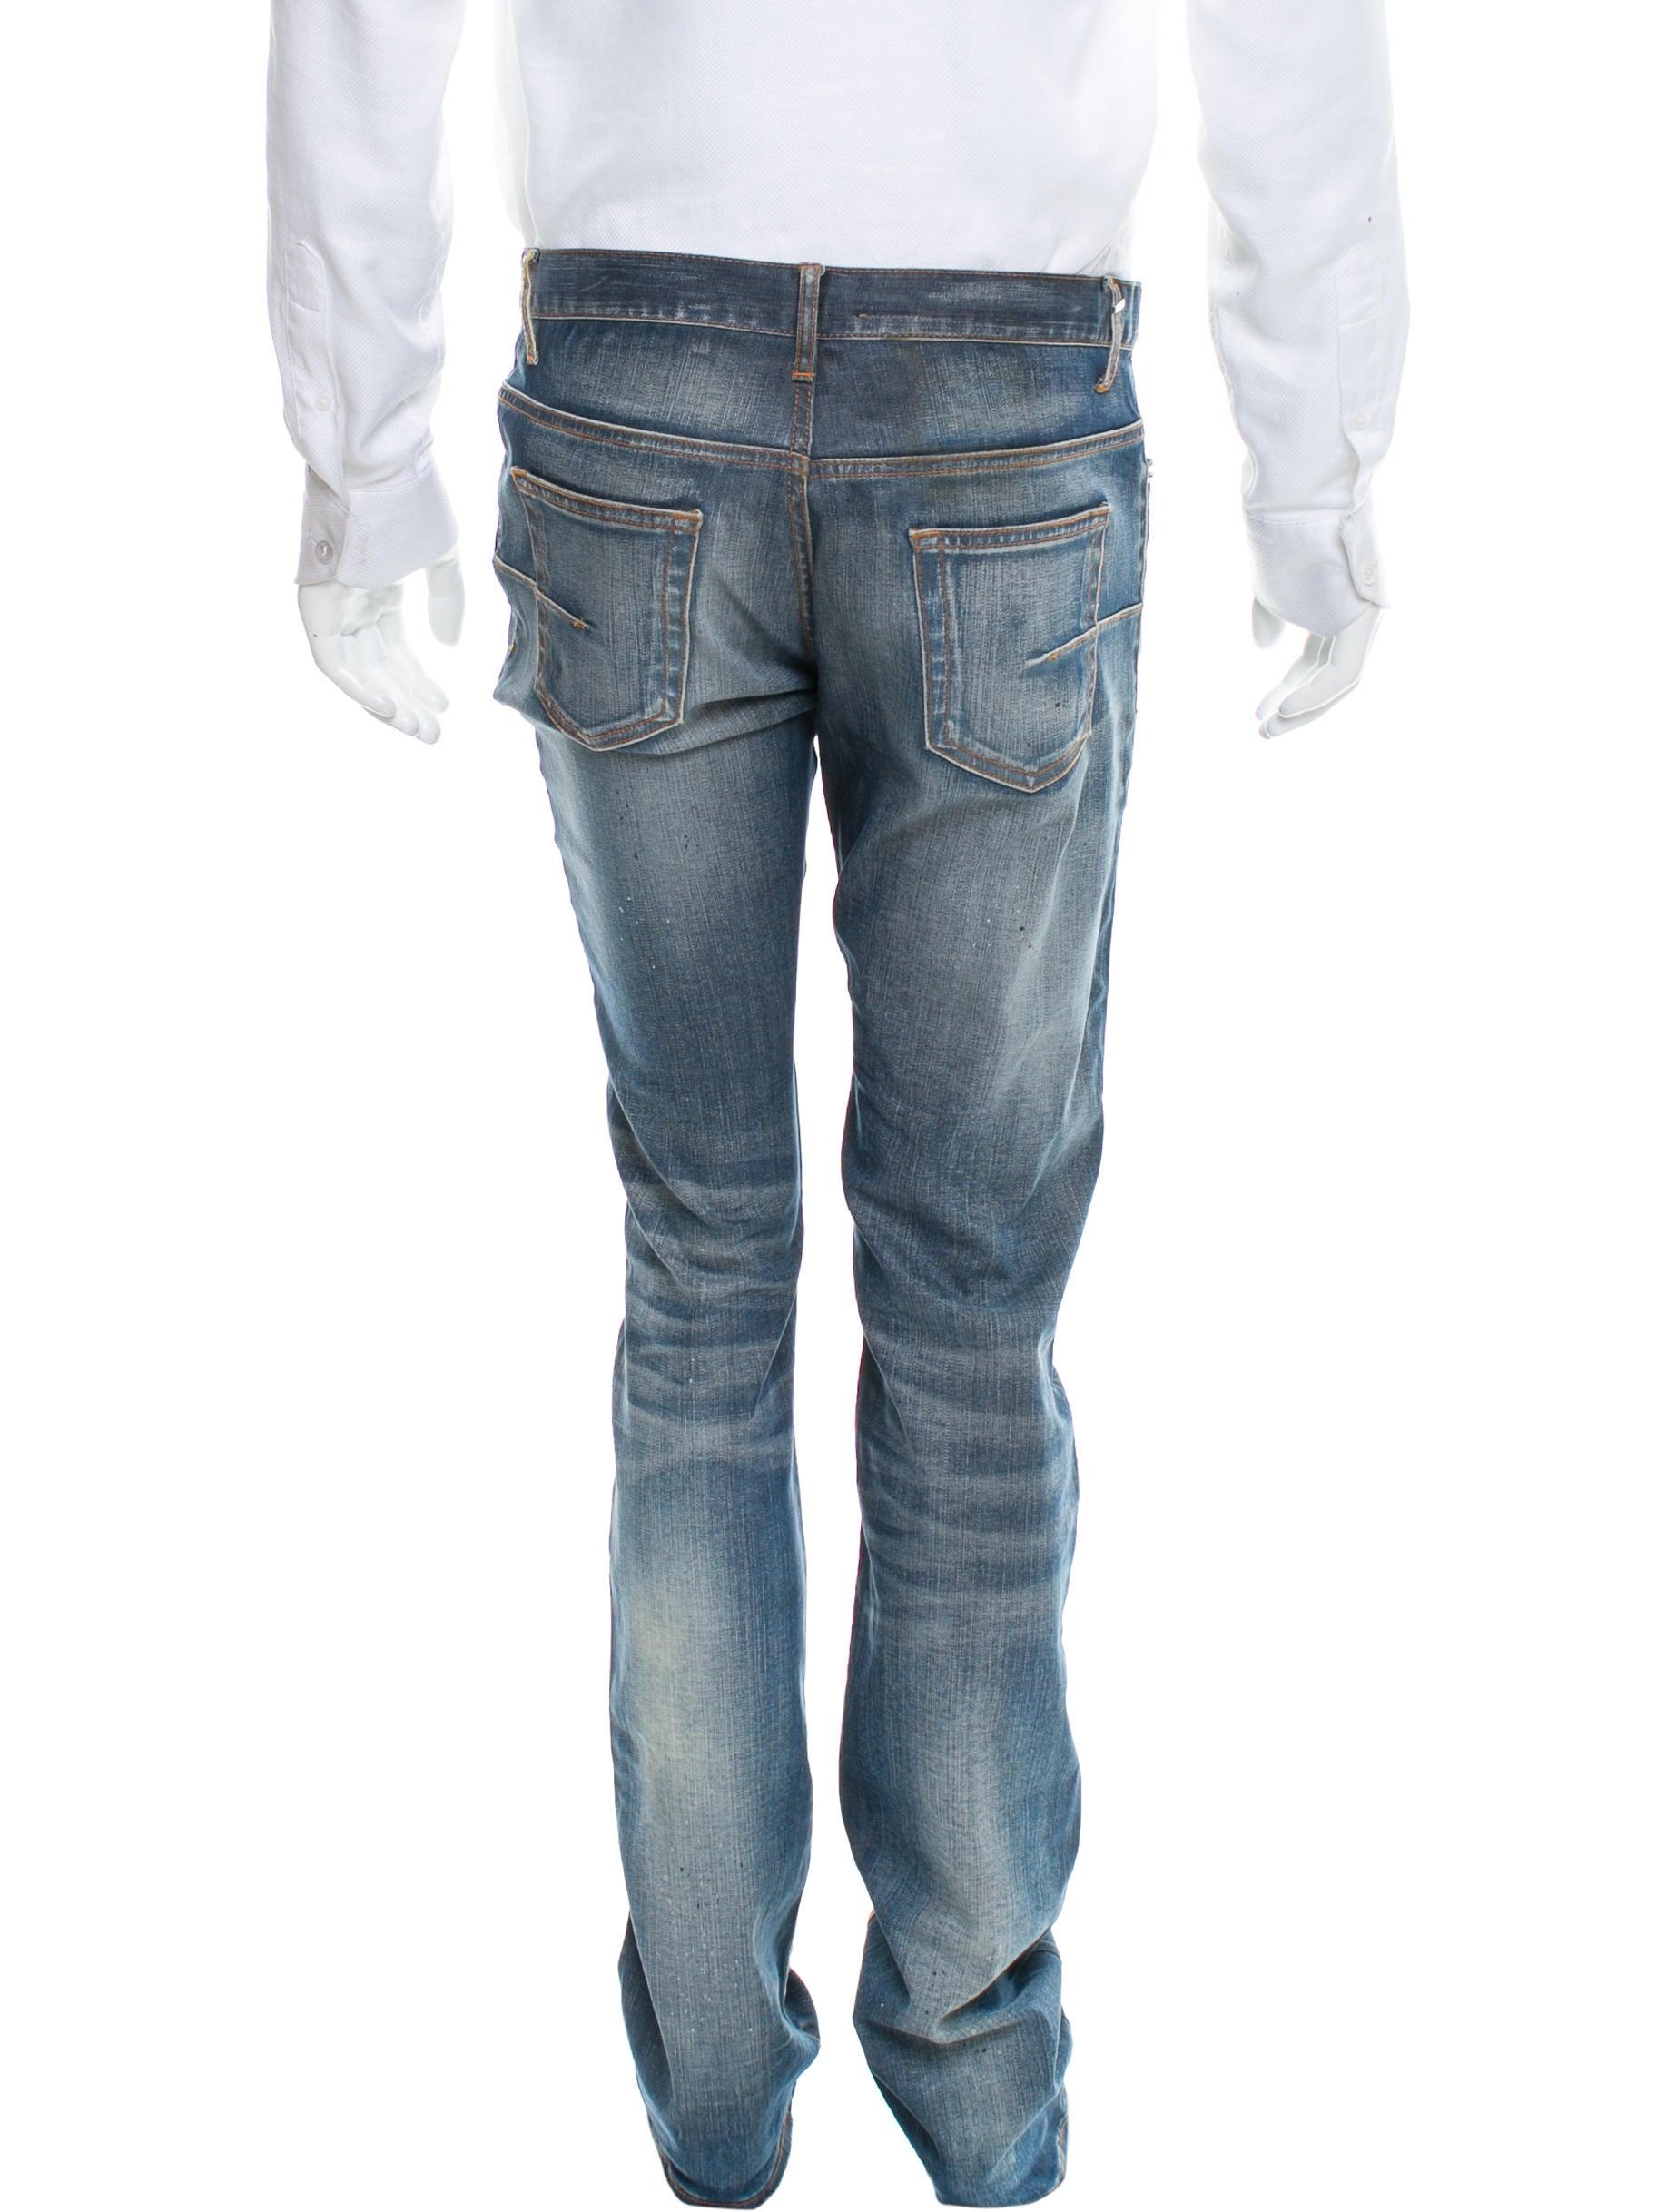 dior homme paint splatter slim fit jeans clothing hmm23308 the realreal. Black Bedroom Furniture Sets. Home Design Ideas